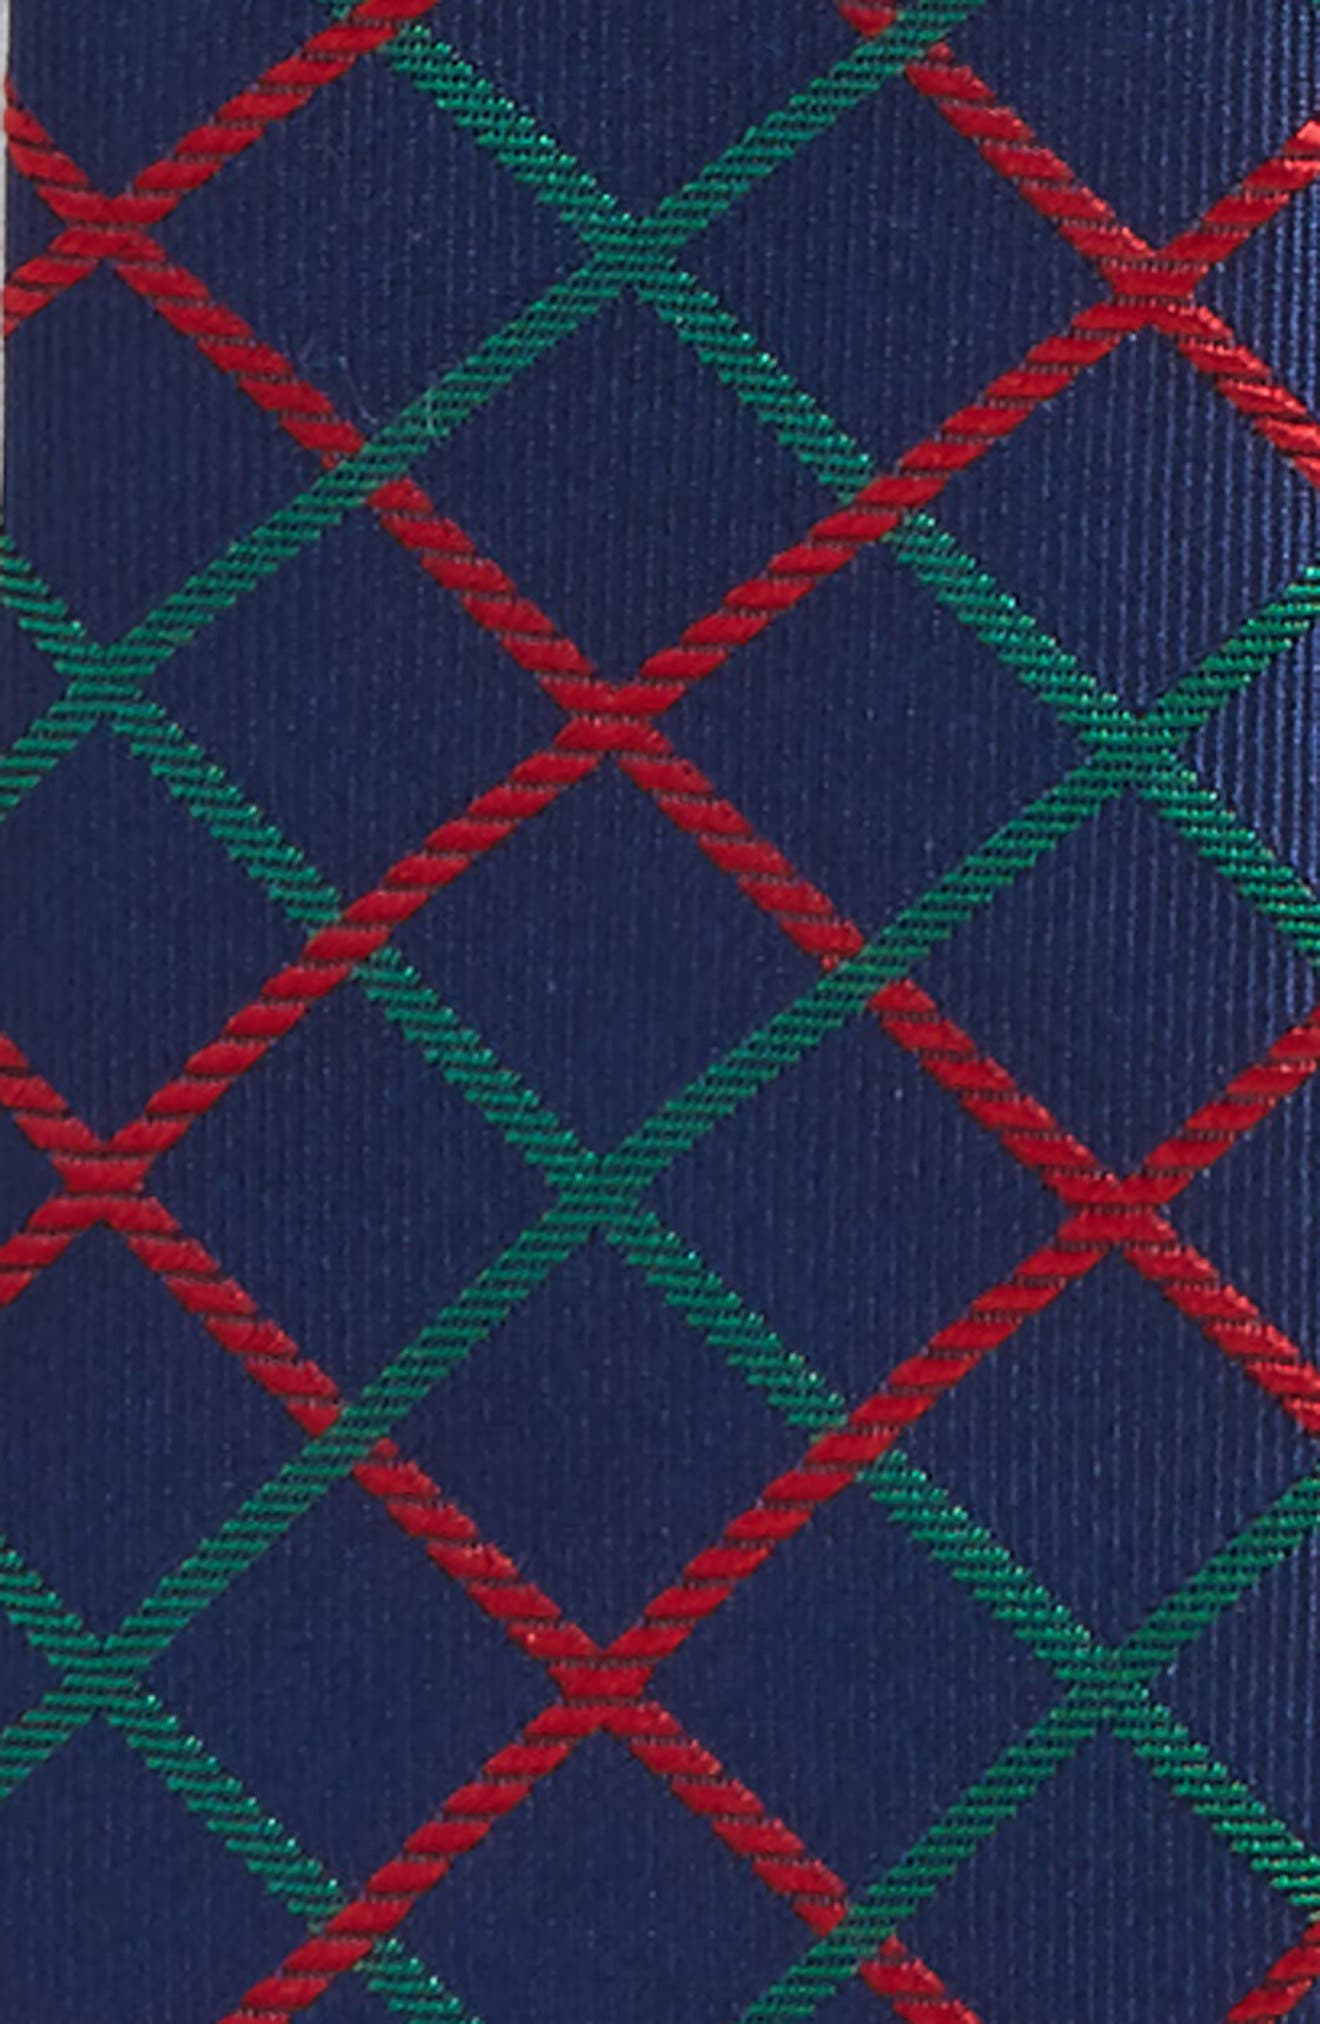 Plaid Silk Zip Tie,                             Alternate thumbnail 11, color,